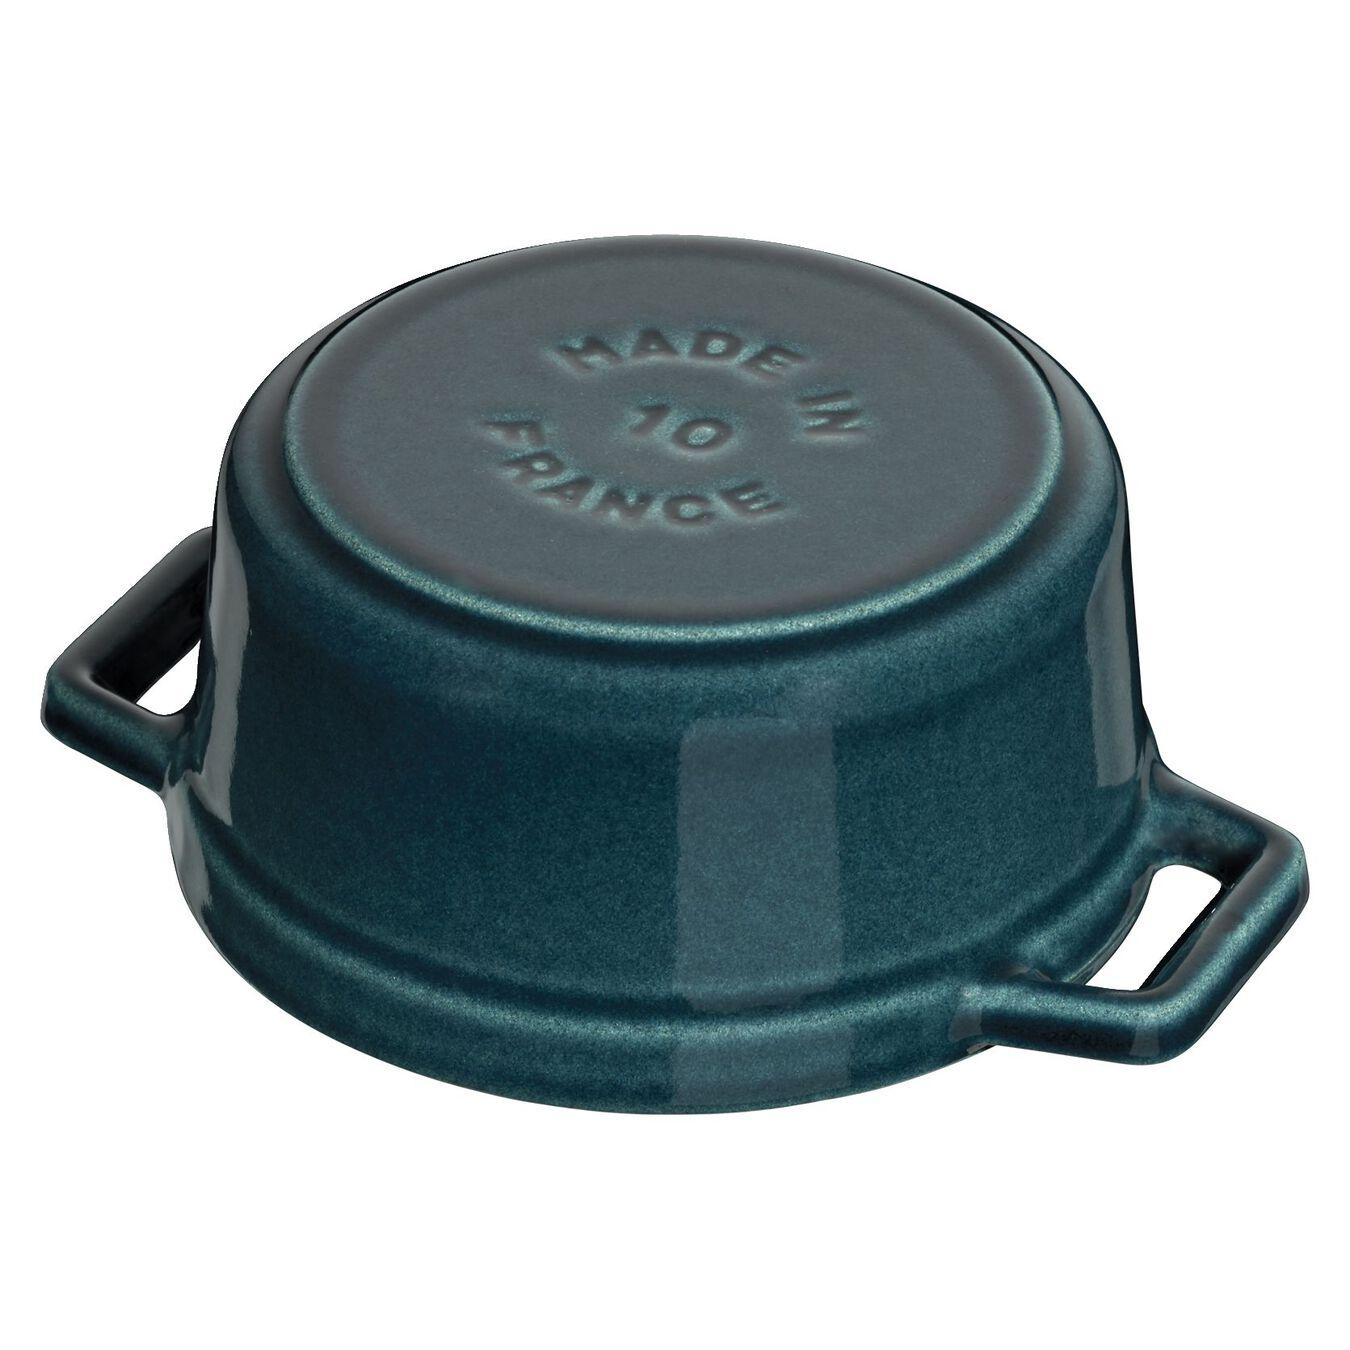 Mini Cocotte 10 cm, rund, La-Mer, Gusseisen,,large 2